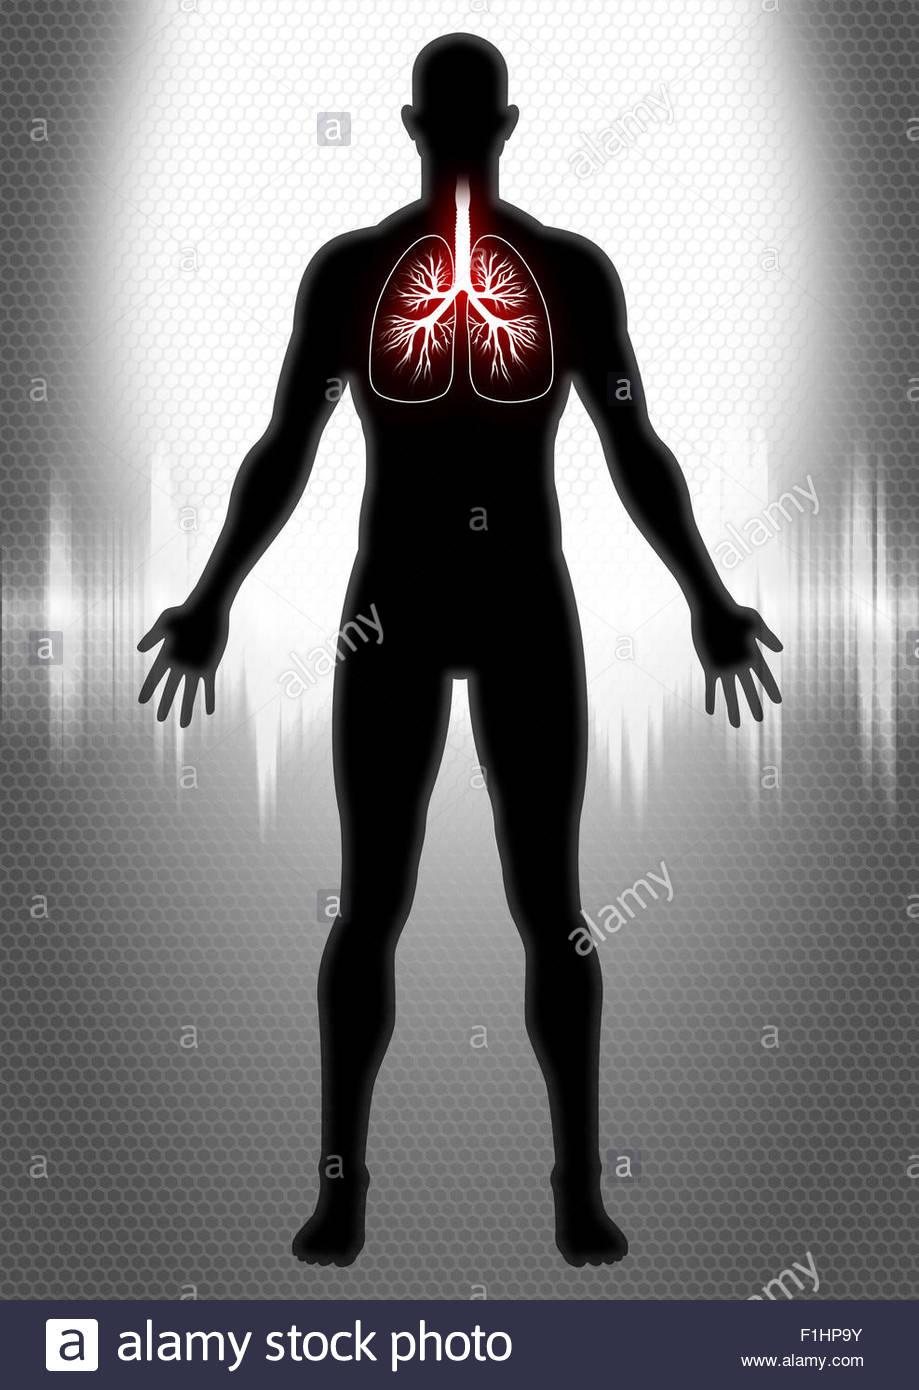 Human Pulmonary - Stock Image